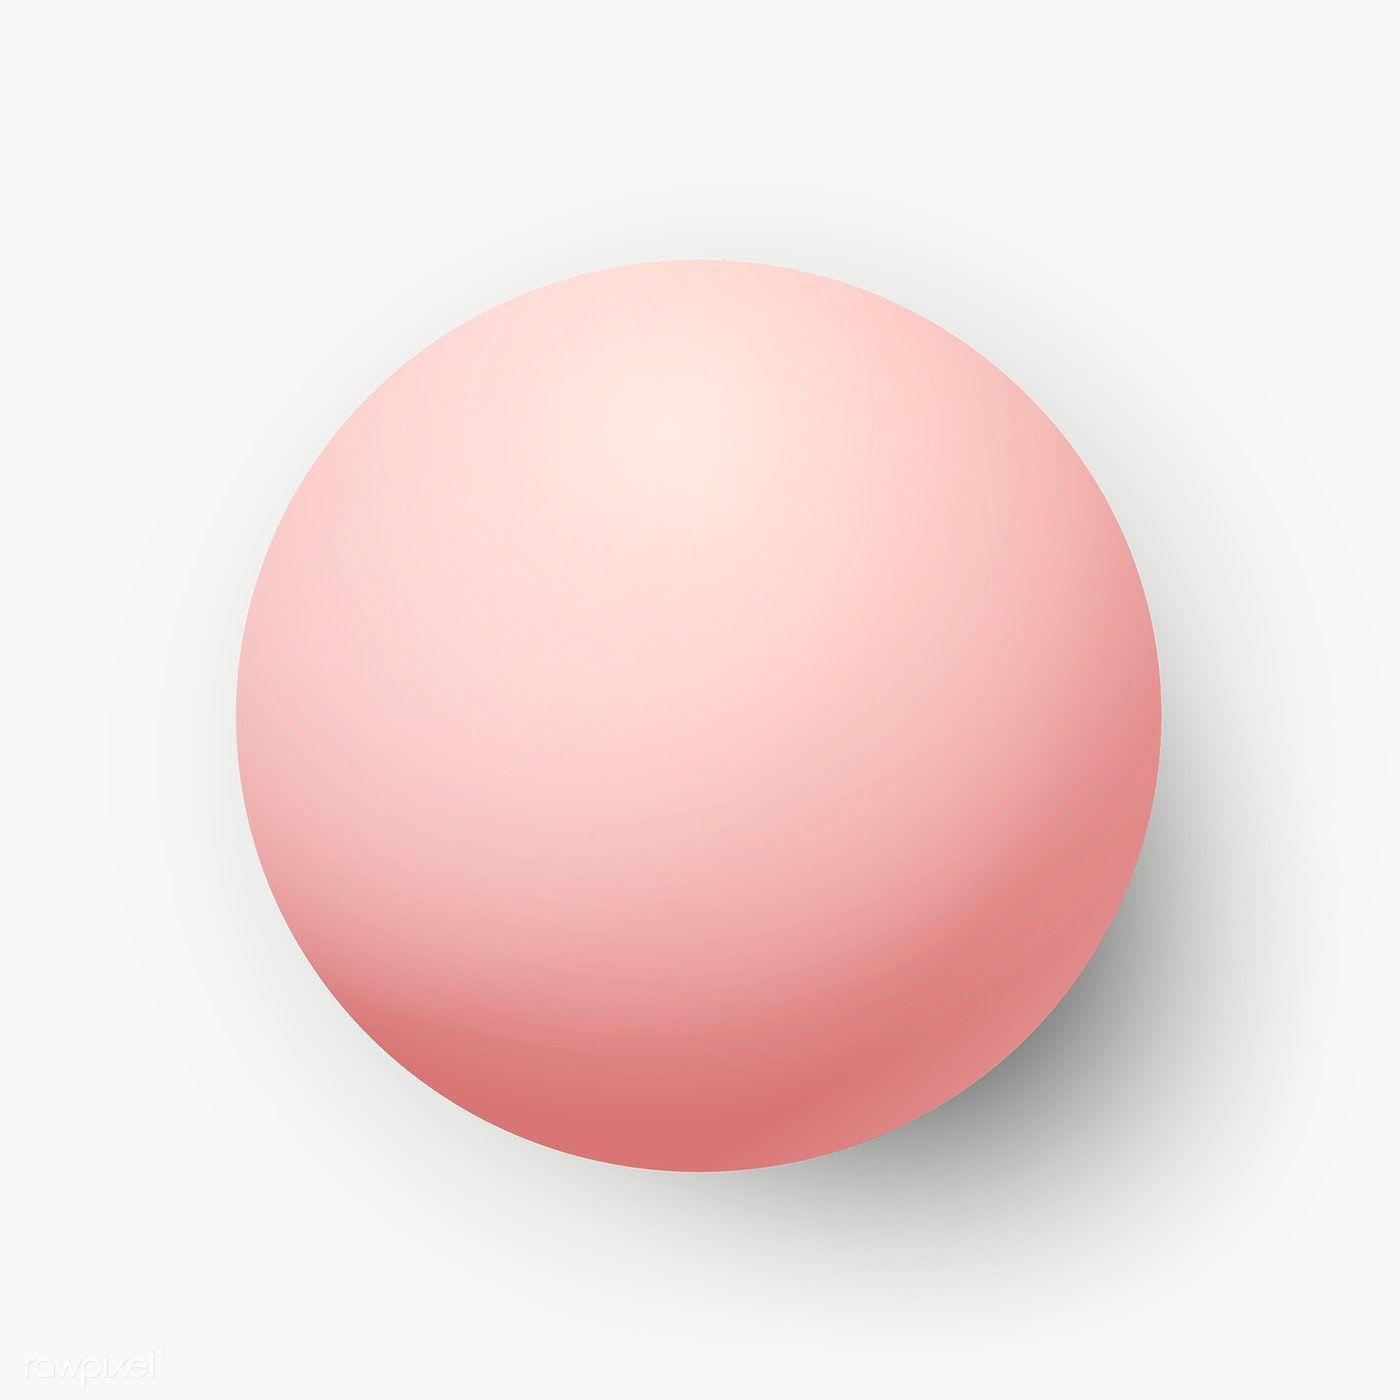 Pastel Pink Geometric Circle Design Social Banner Free Image By Rawpixel Com Kappy Kappy Geometric Circle Circle Design Pastel Pink